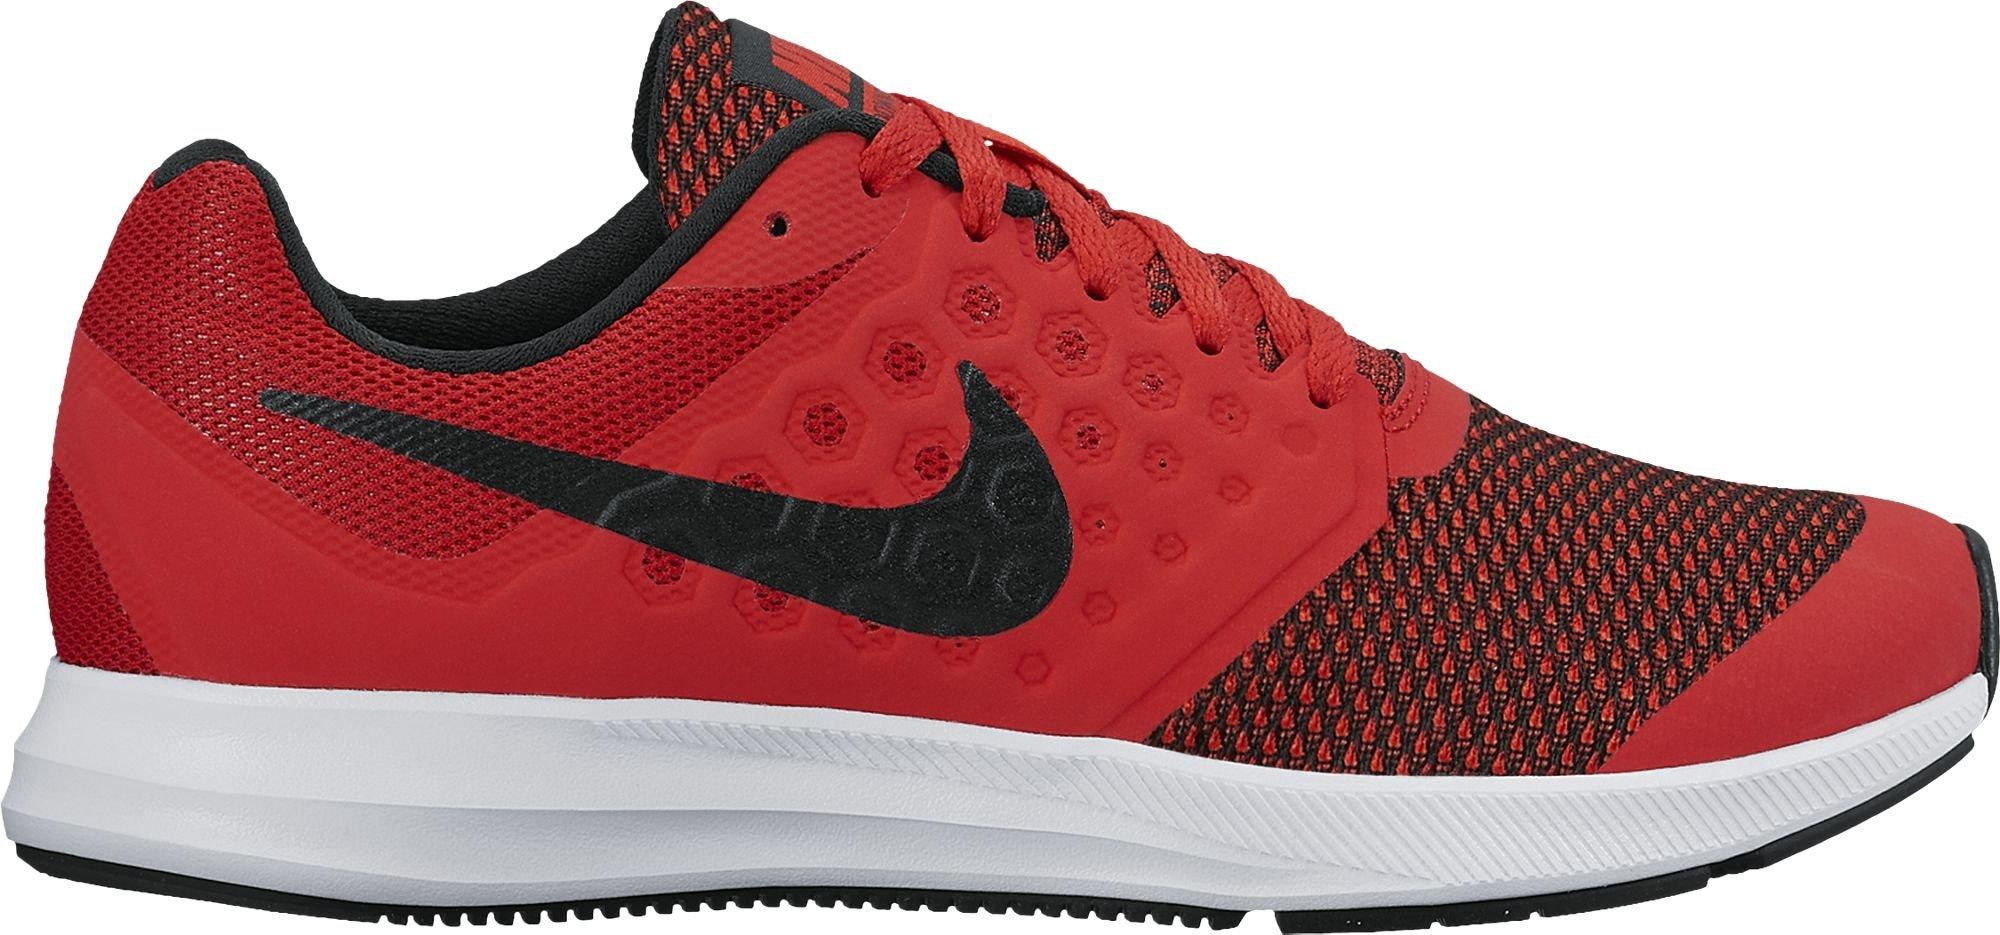 Nike Downshifter 7 (Gs) Big Kids Style: 869969-600 Size: 5